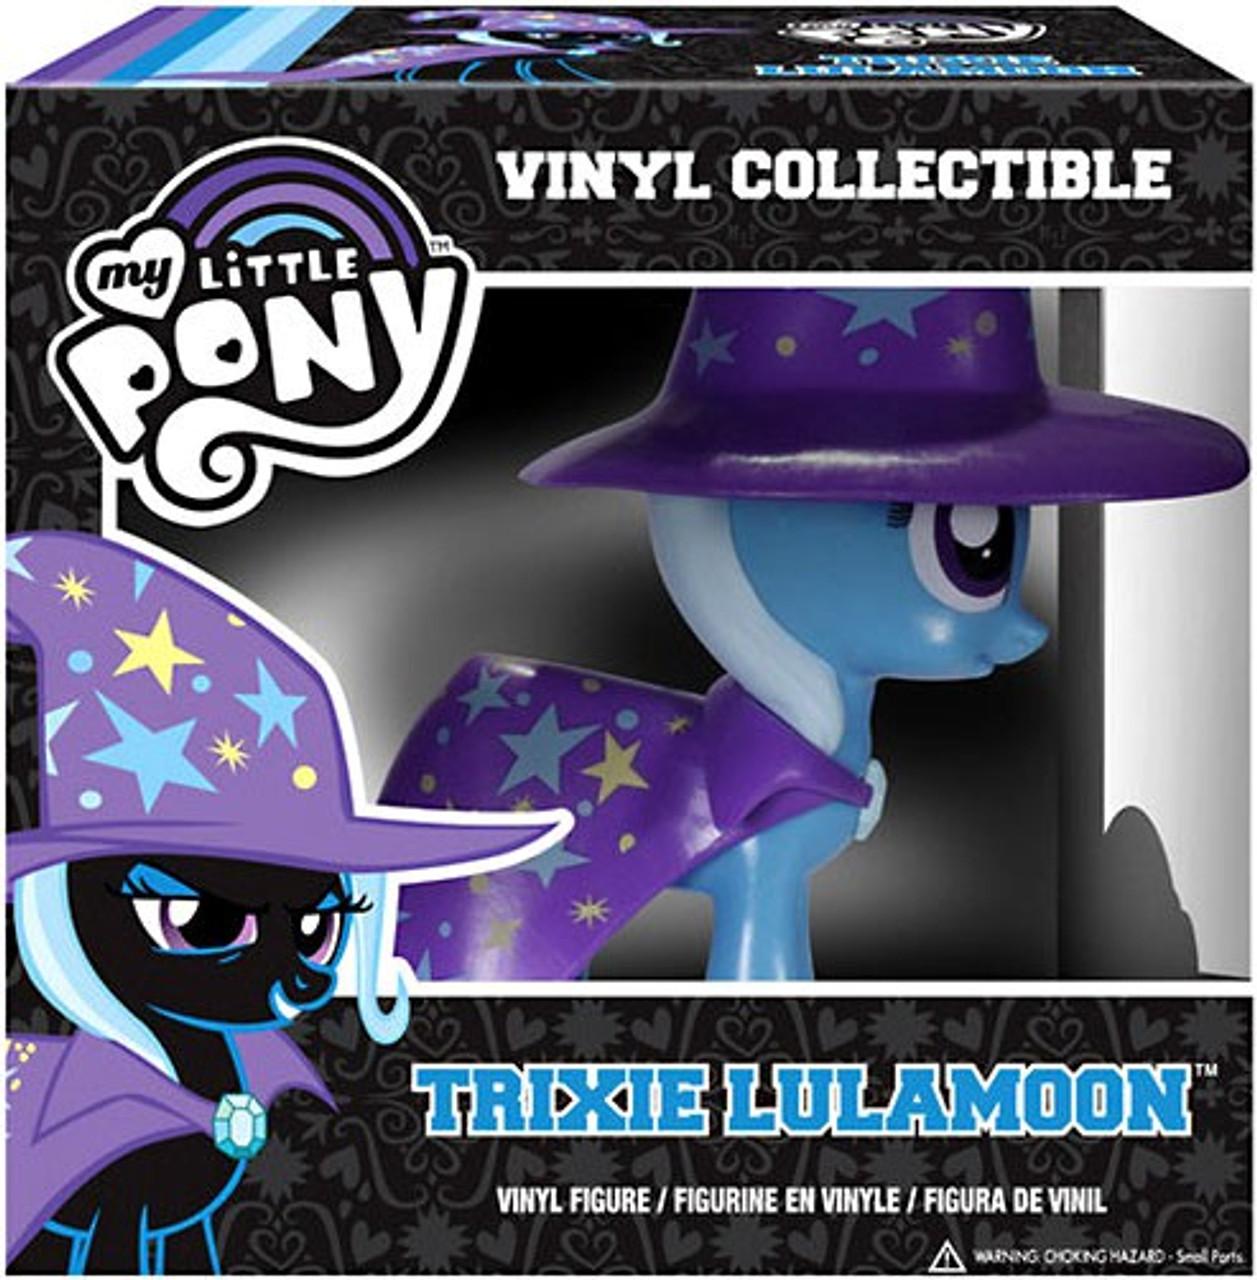 Funko Vinyl Collectible My Little Pony-Trixie Lulamoon New